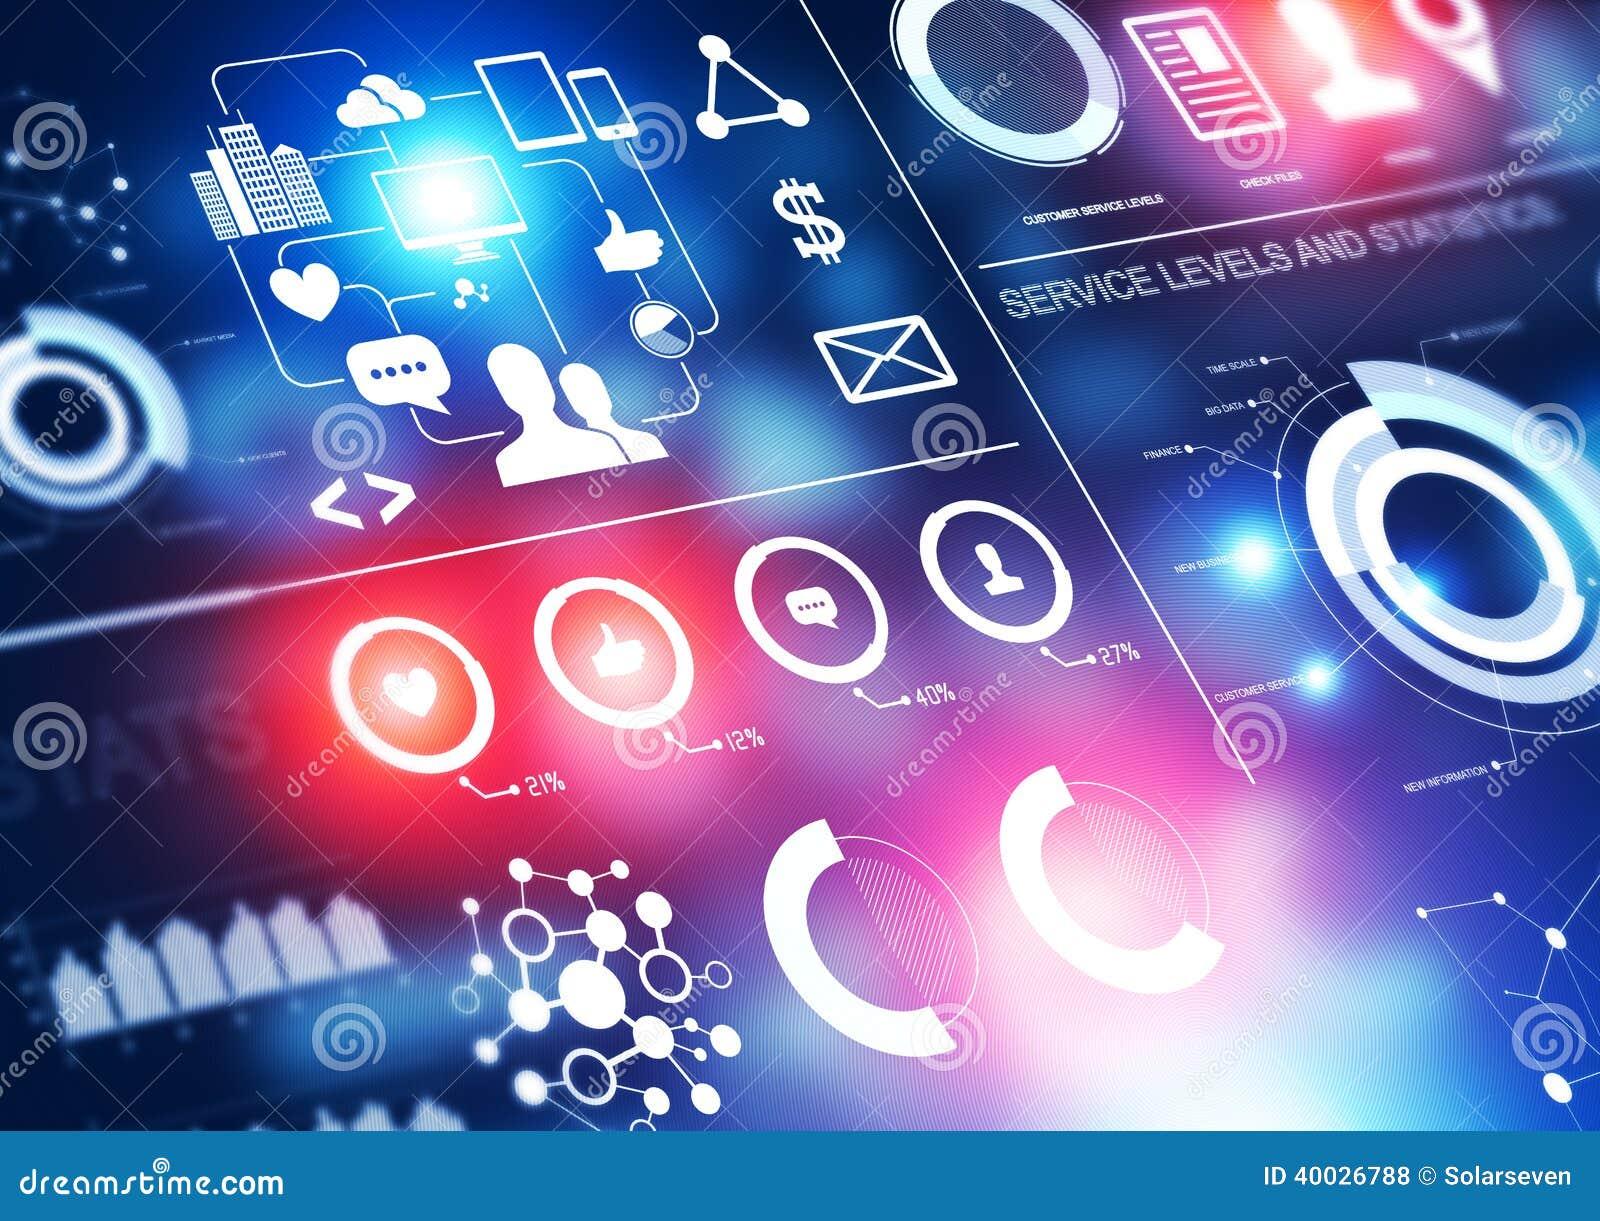 Statistics Business Background